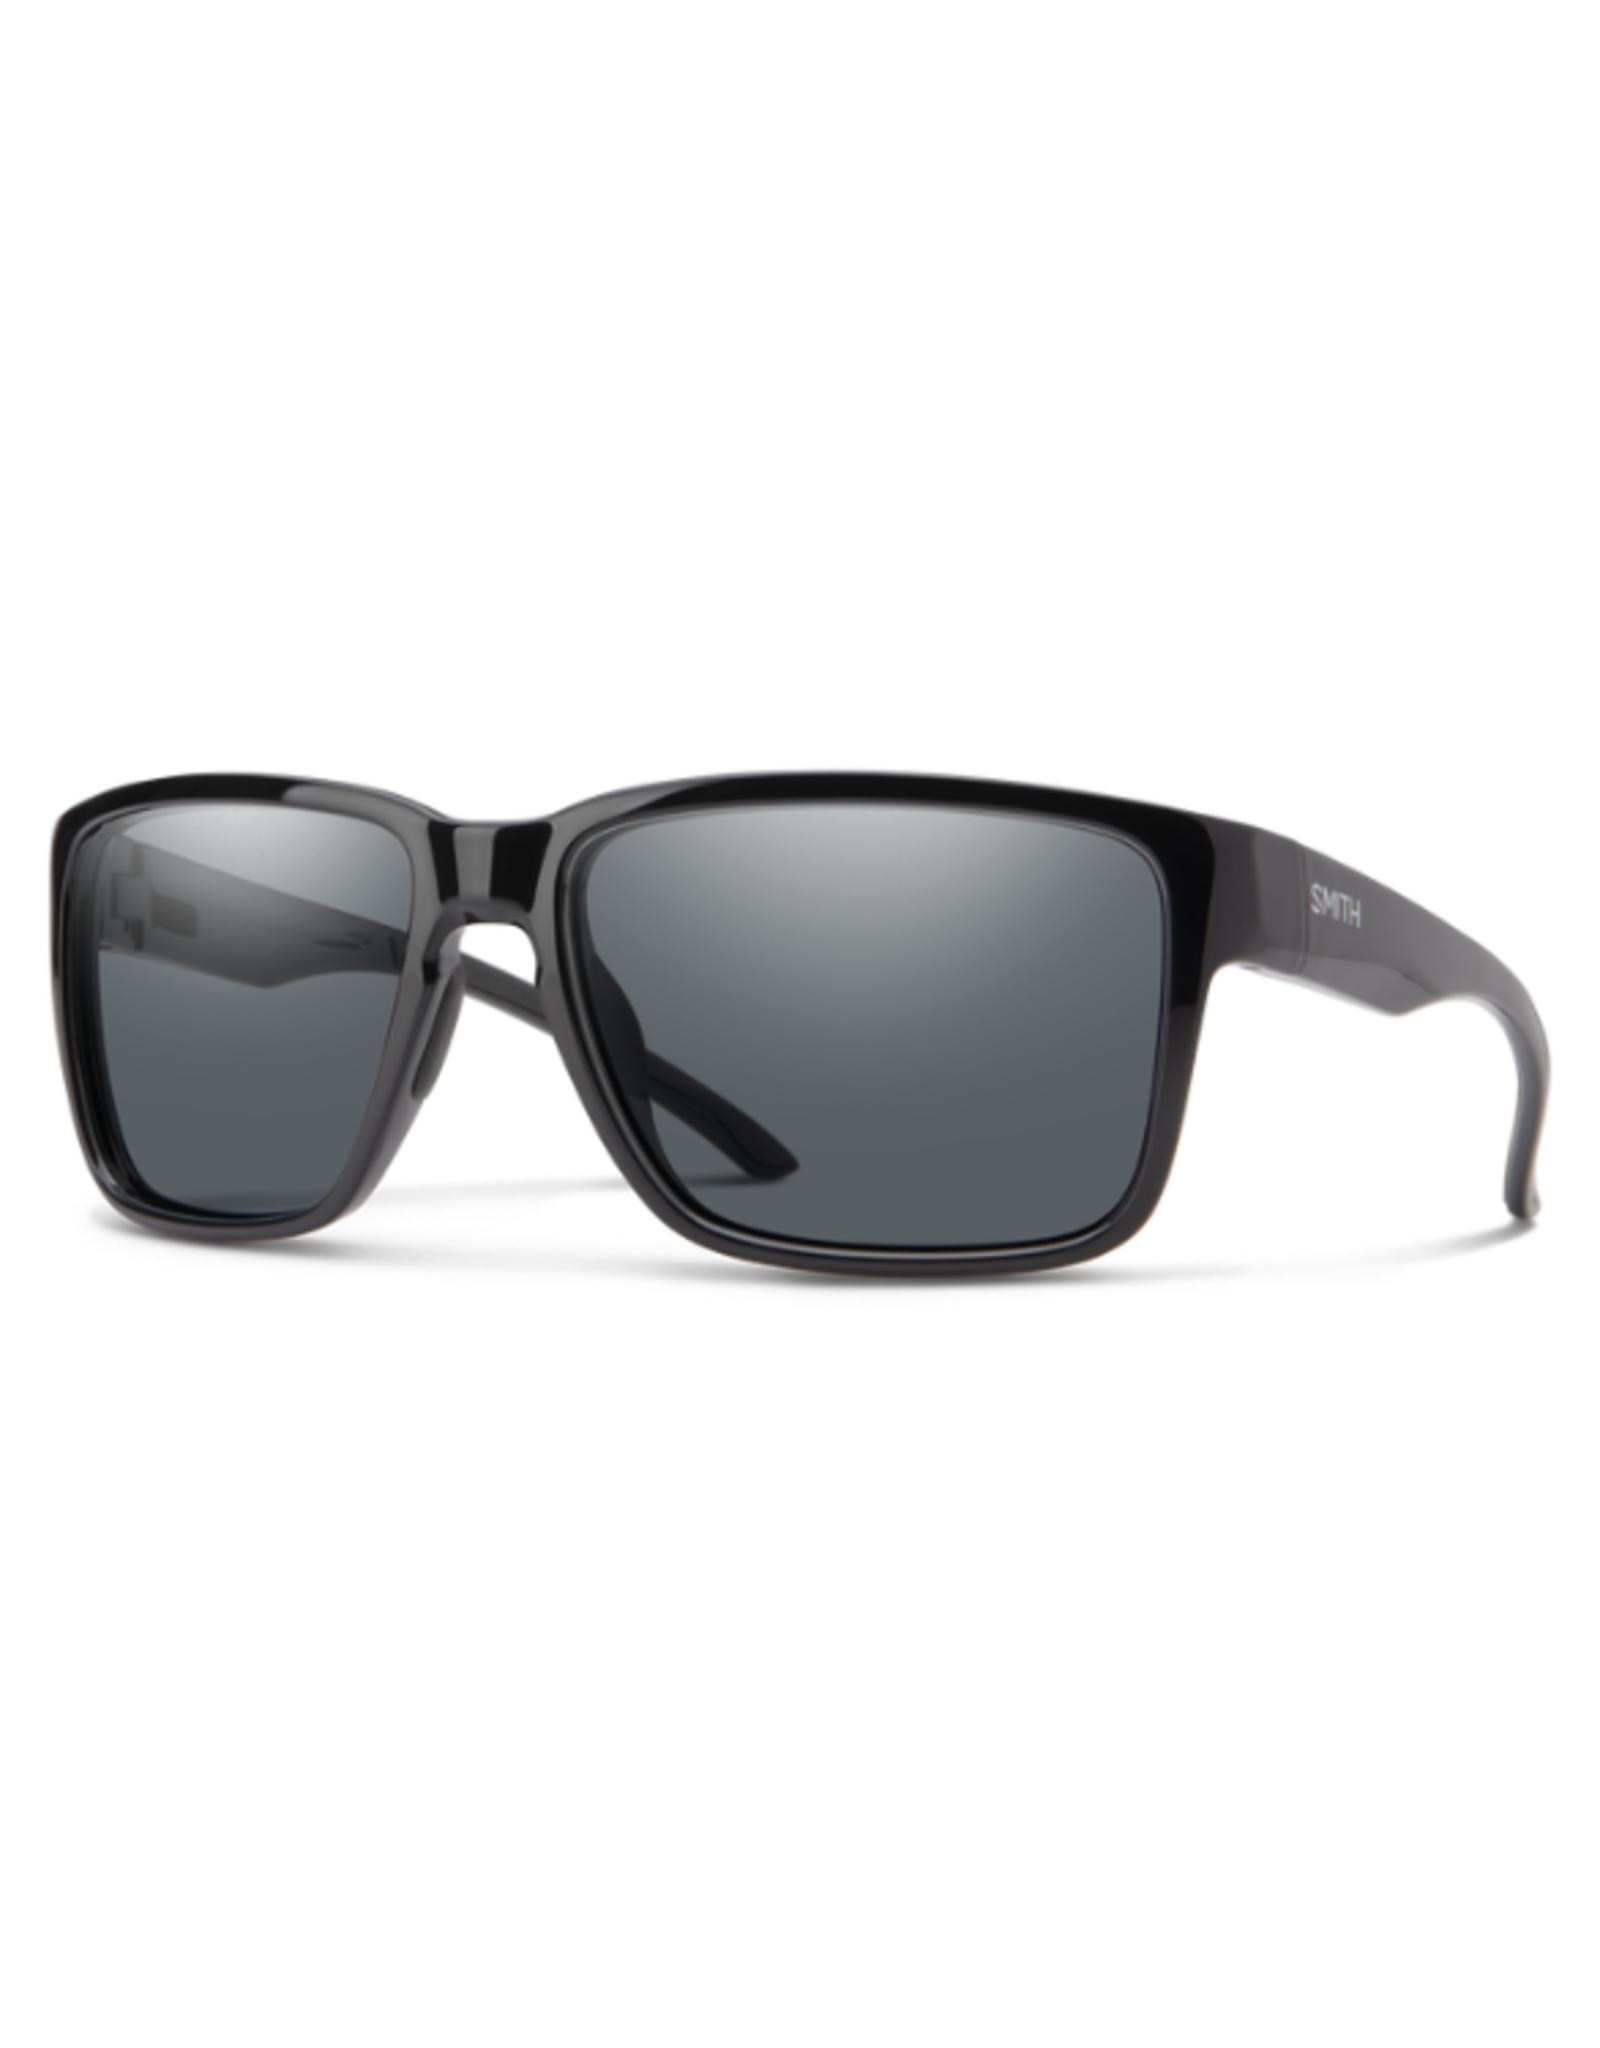 Smith Smith Emerge Sunglasses Black Polarized Grey